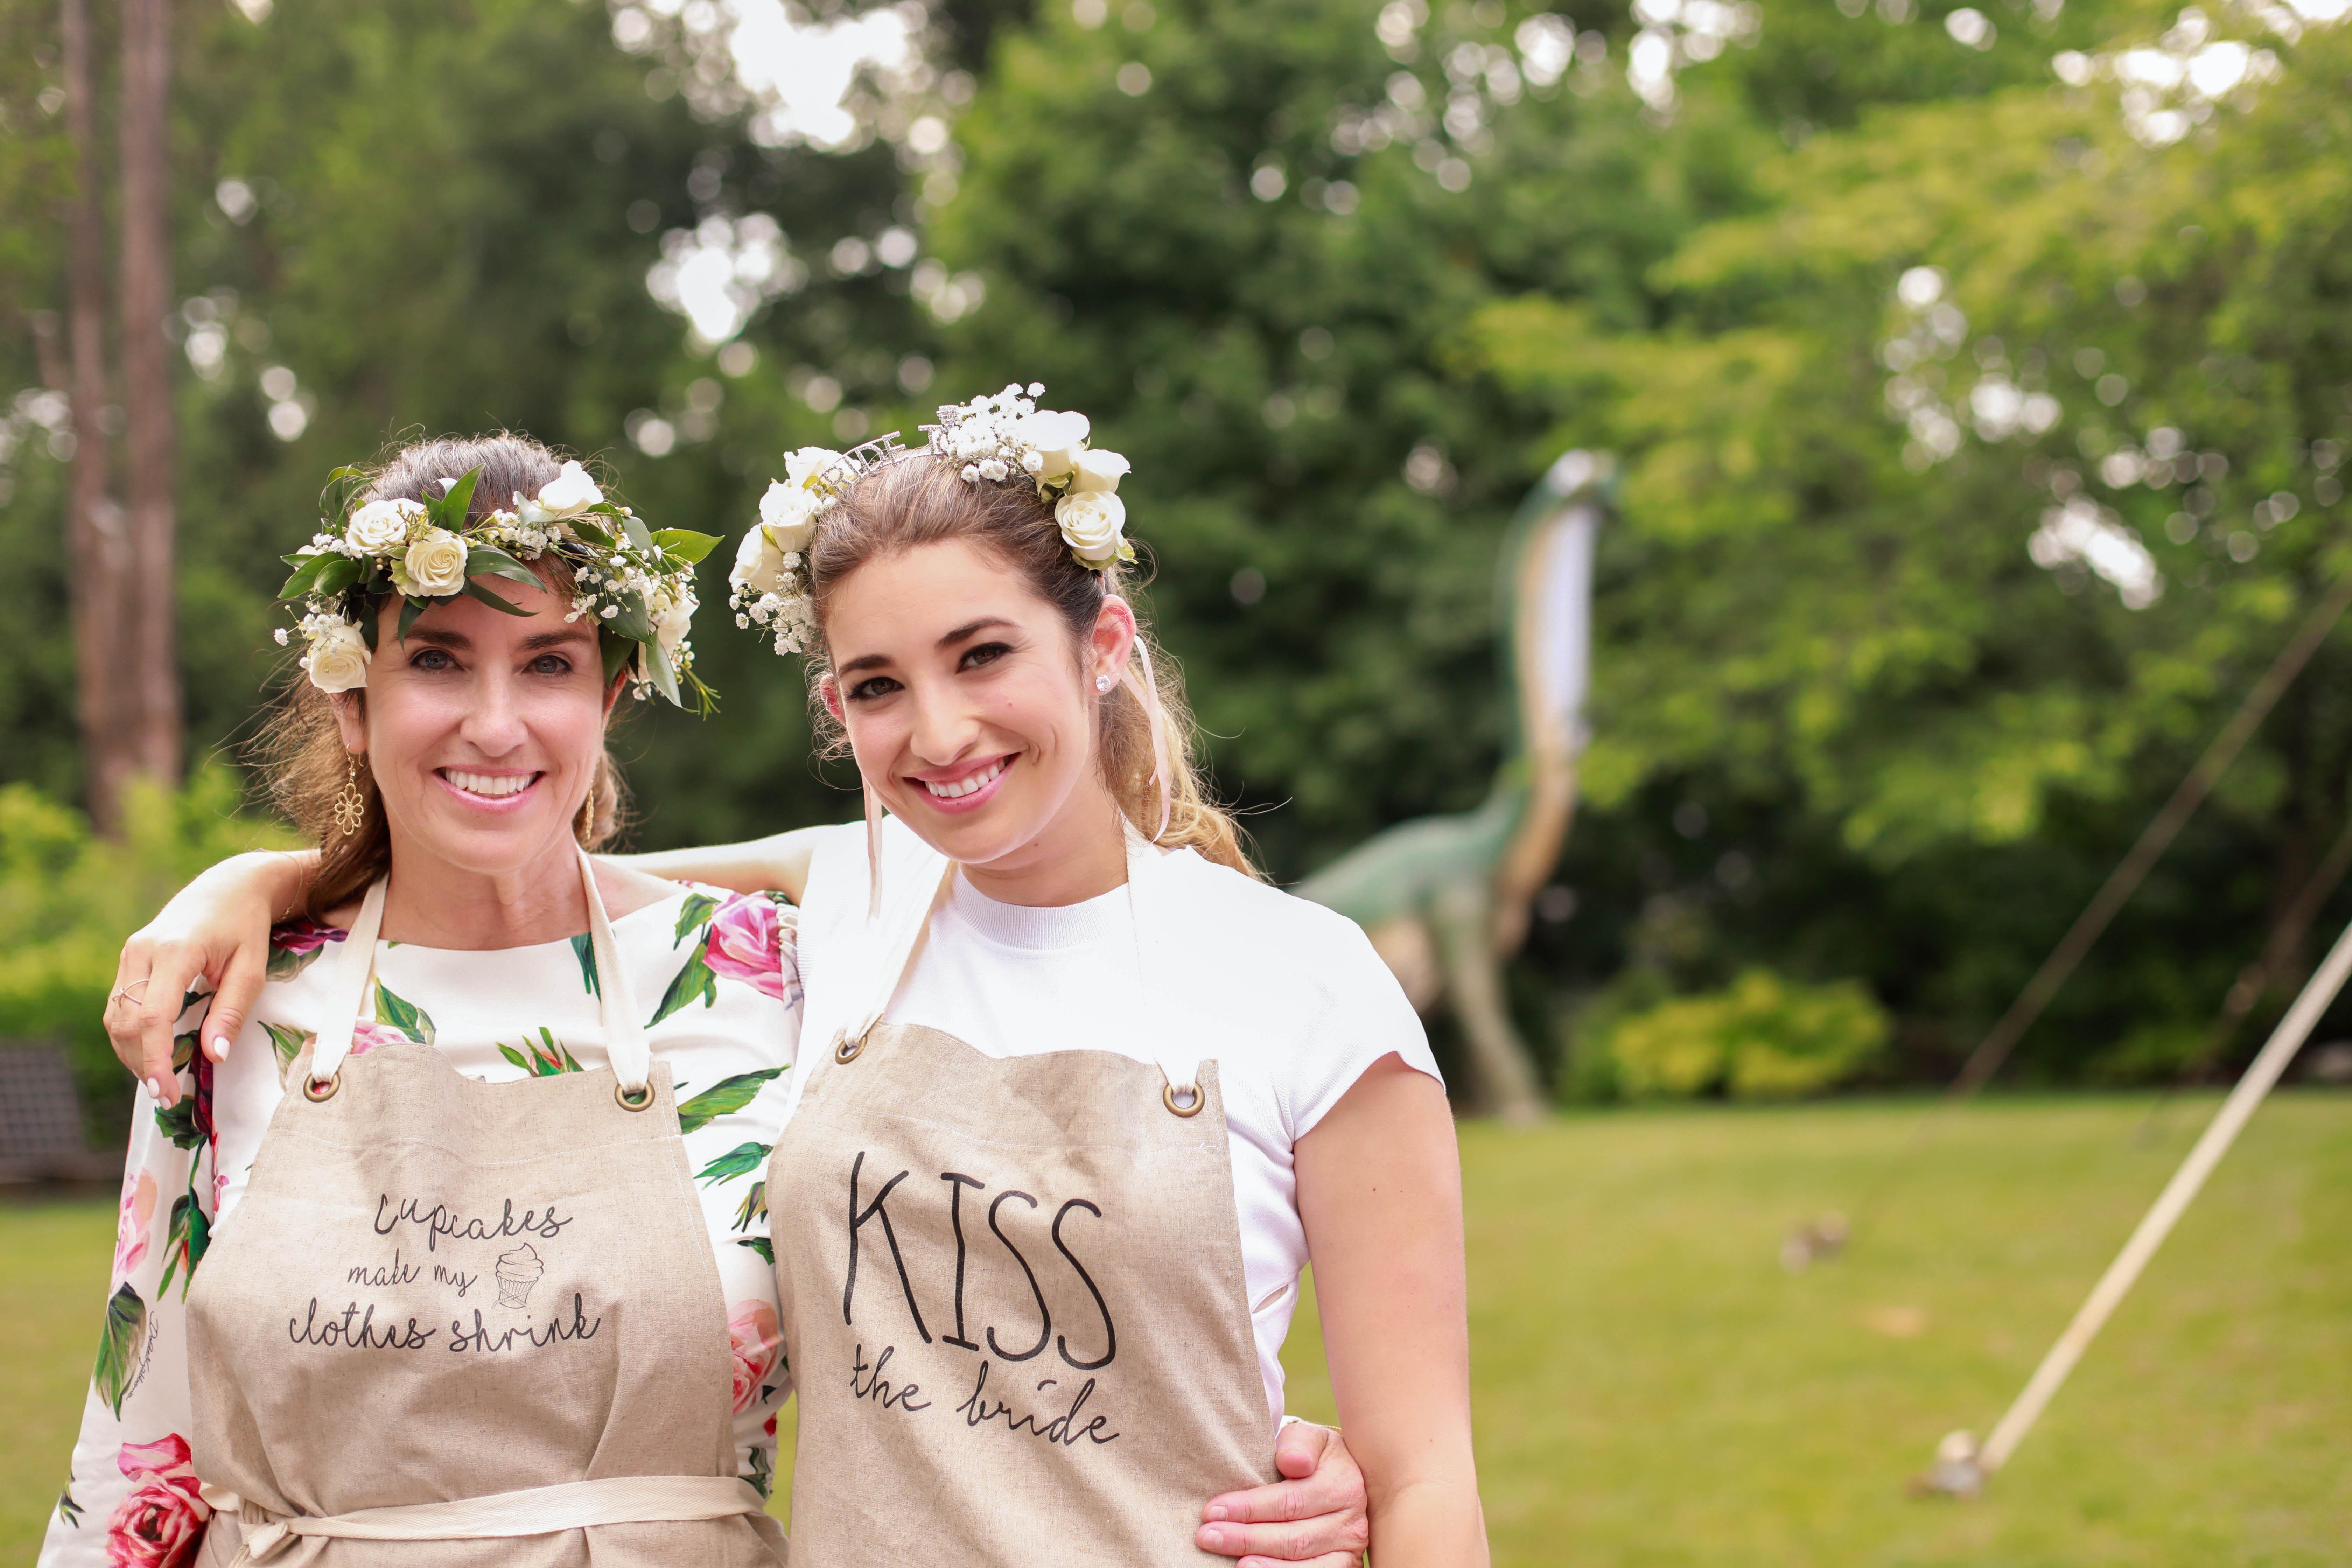 bridal shower mother bride outdoors apron flower crowns